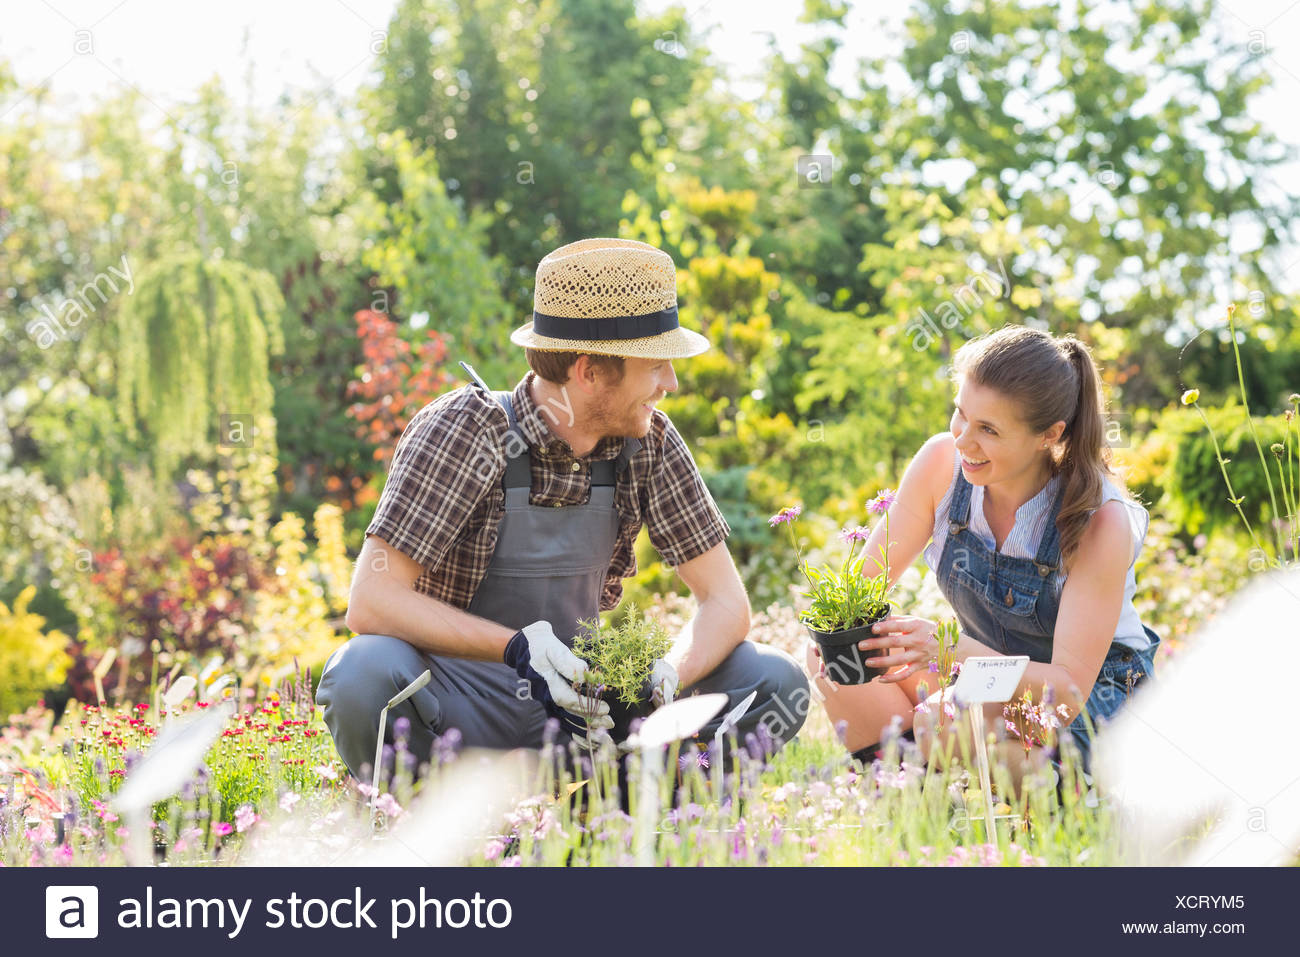 Gardeners talking while gardening at plant nursery - Stock Image